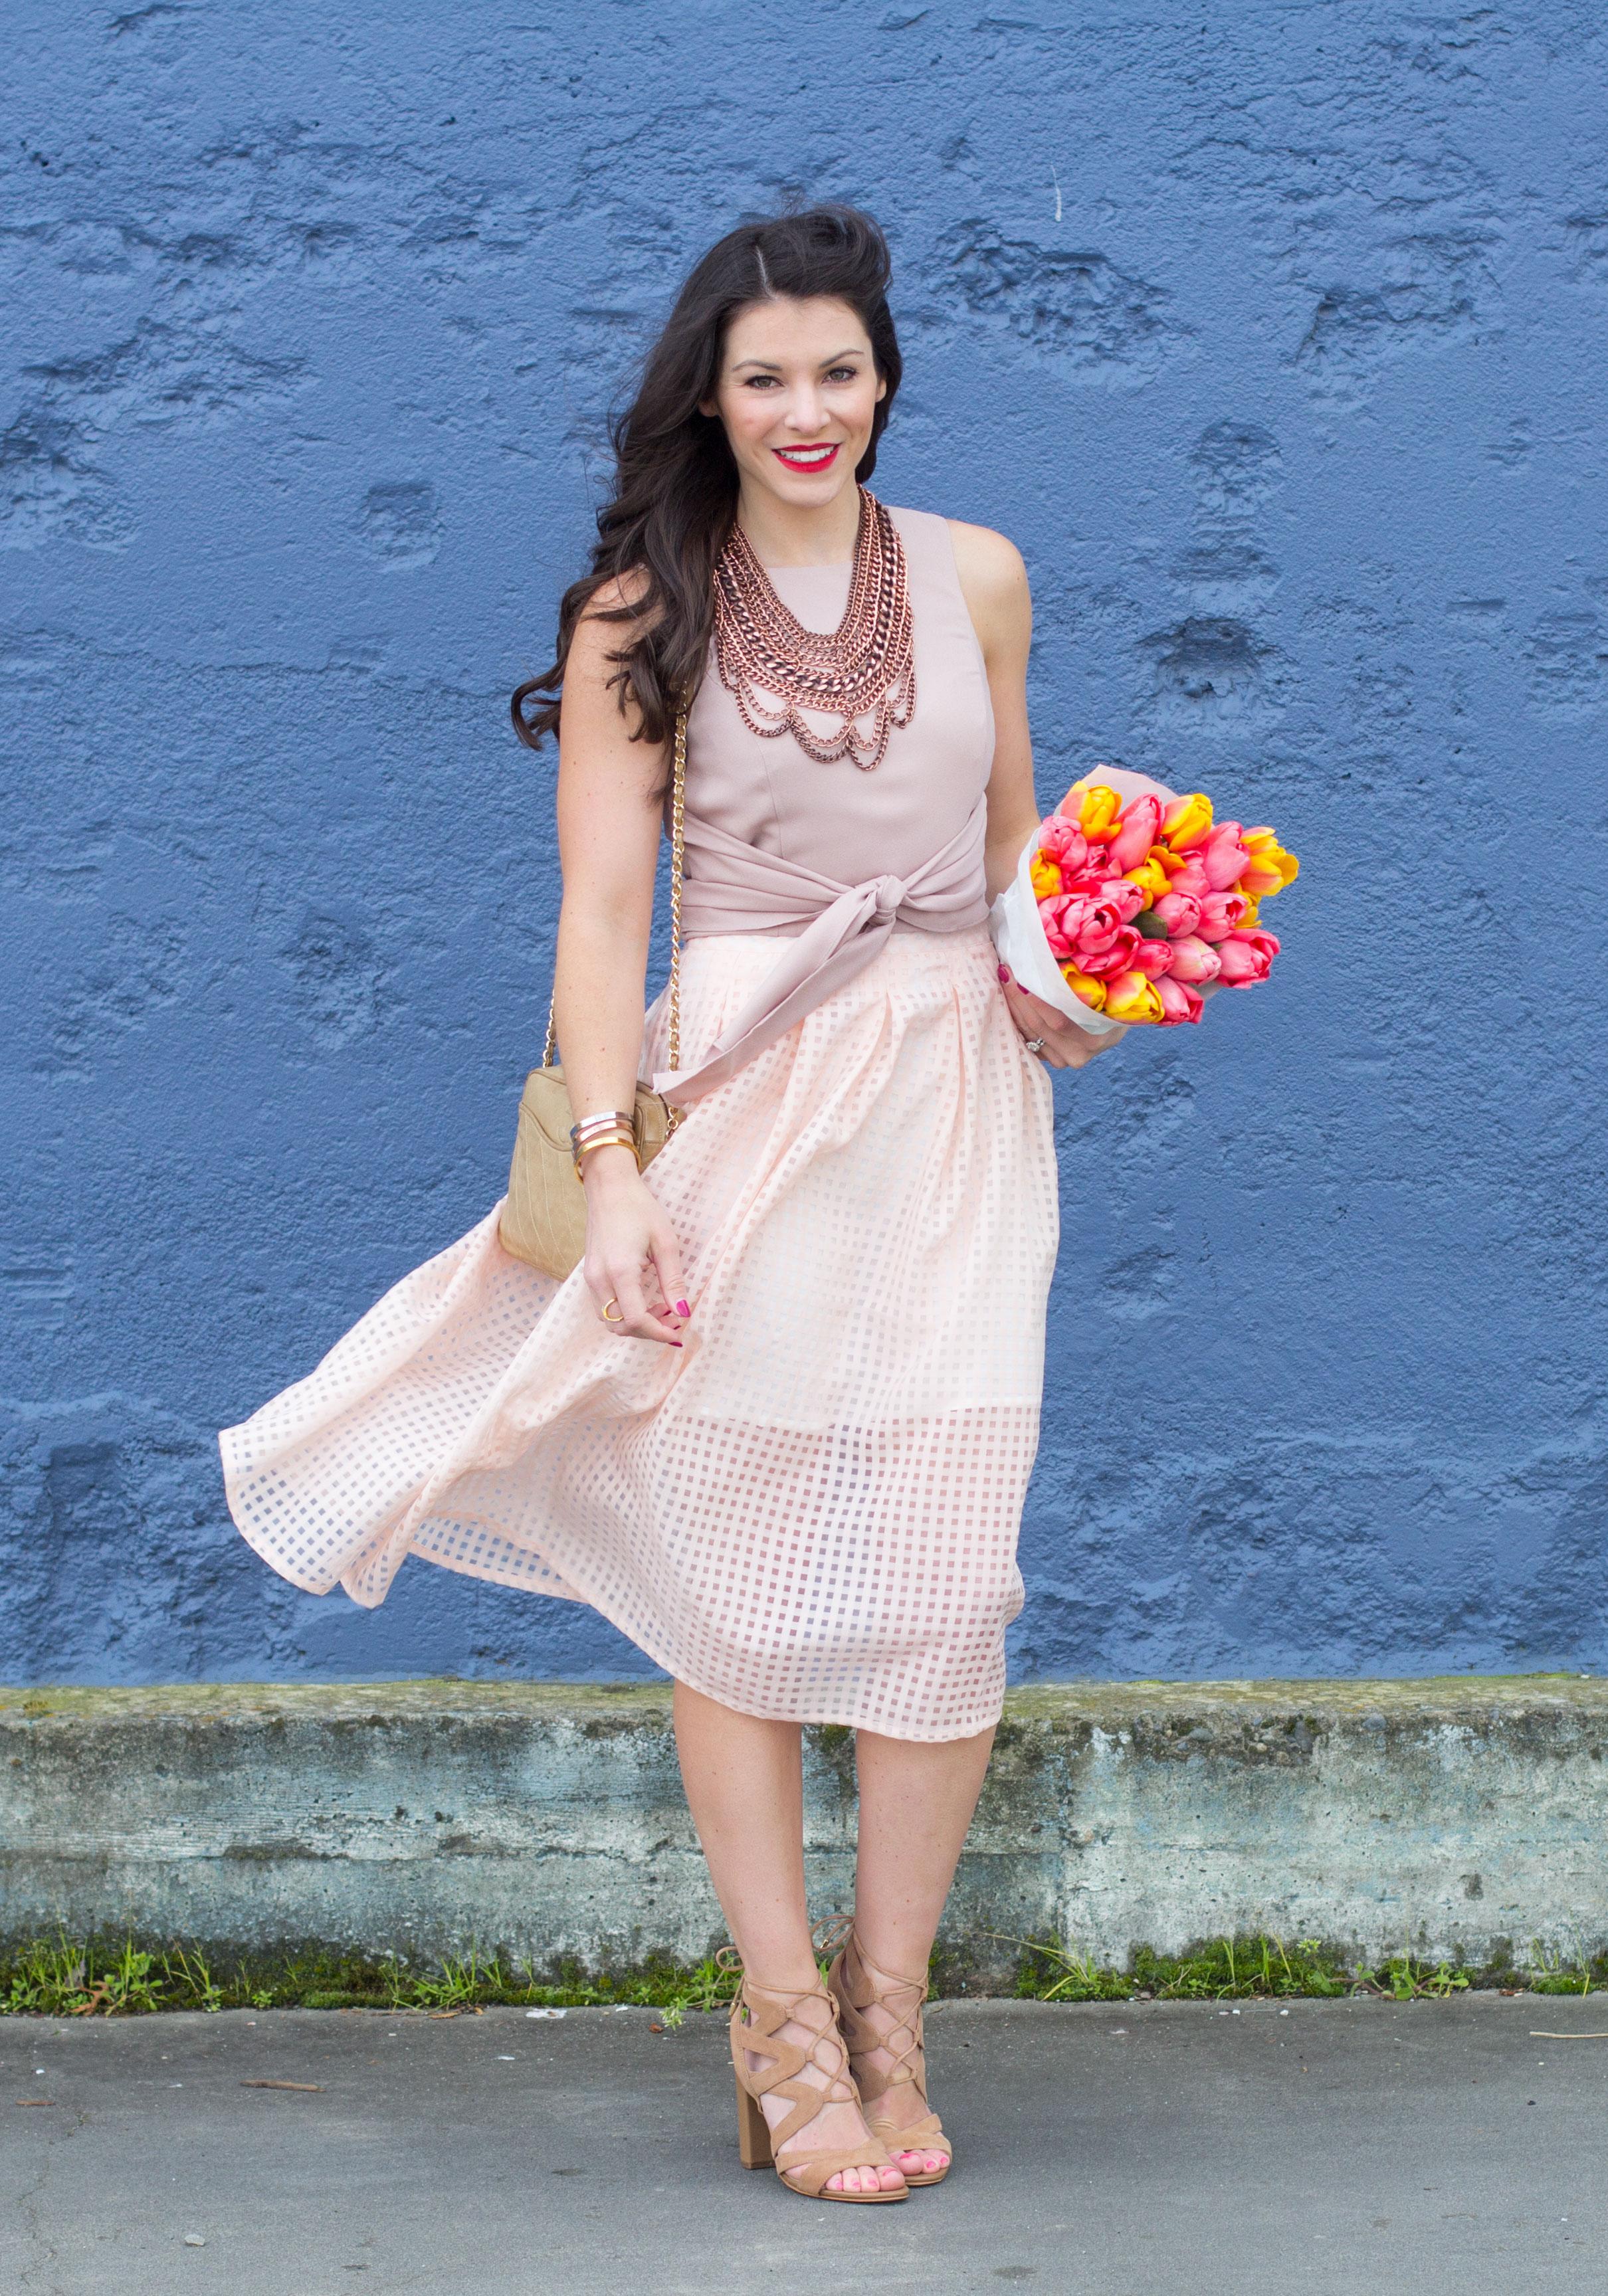 Midi Skirt Outfit, Crop Top With Midi Skirt, Baublebar Courtney Bib Necklace, Vintage Chanel Handbag, Green Drape Front Jacket, Sam Edelman Yardley Sandals, Spring Outfit